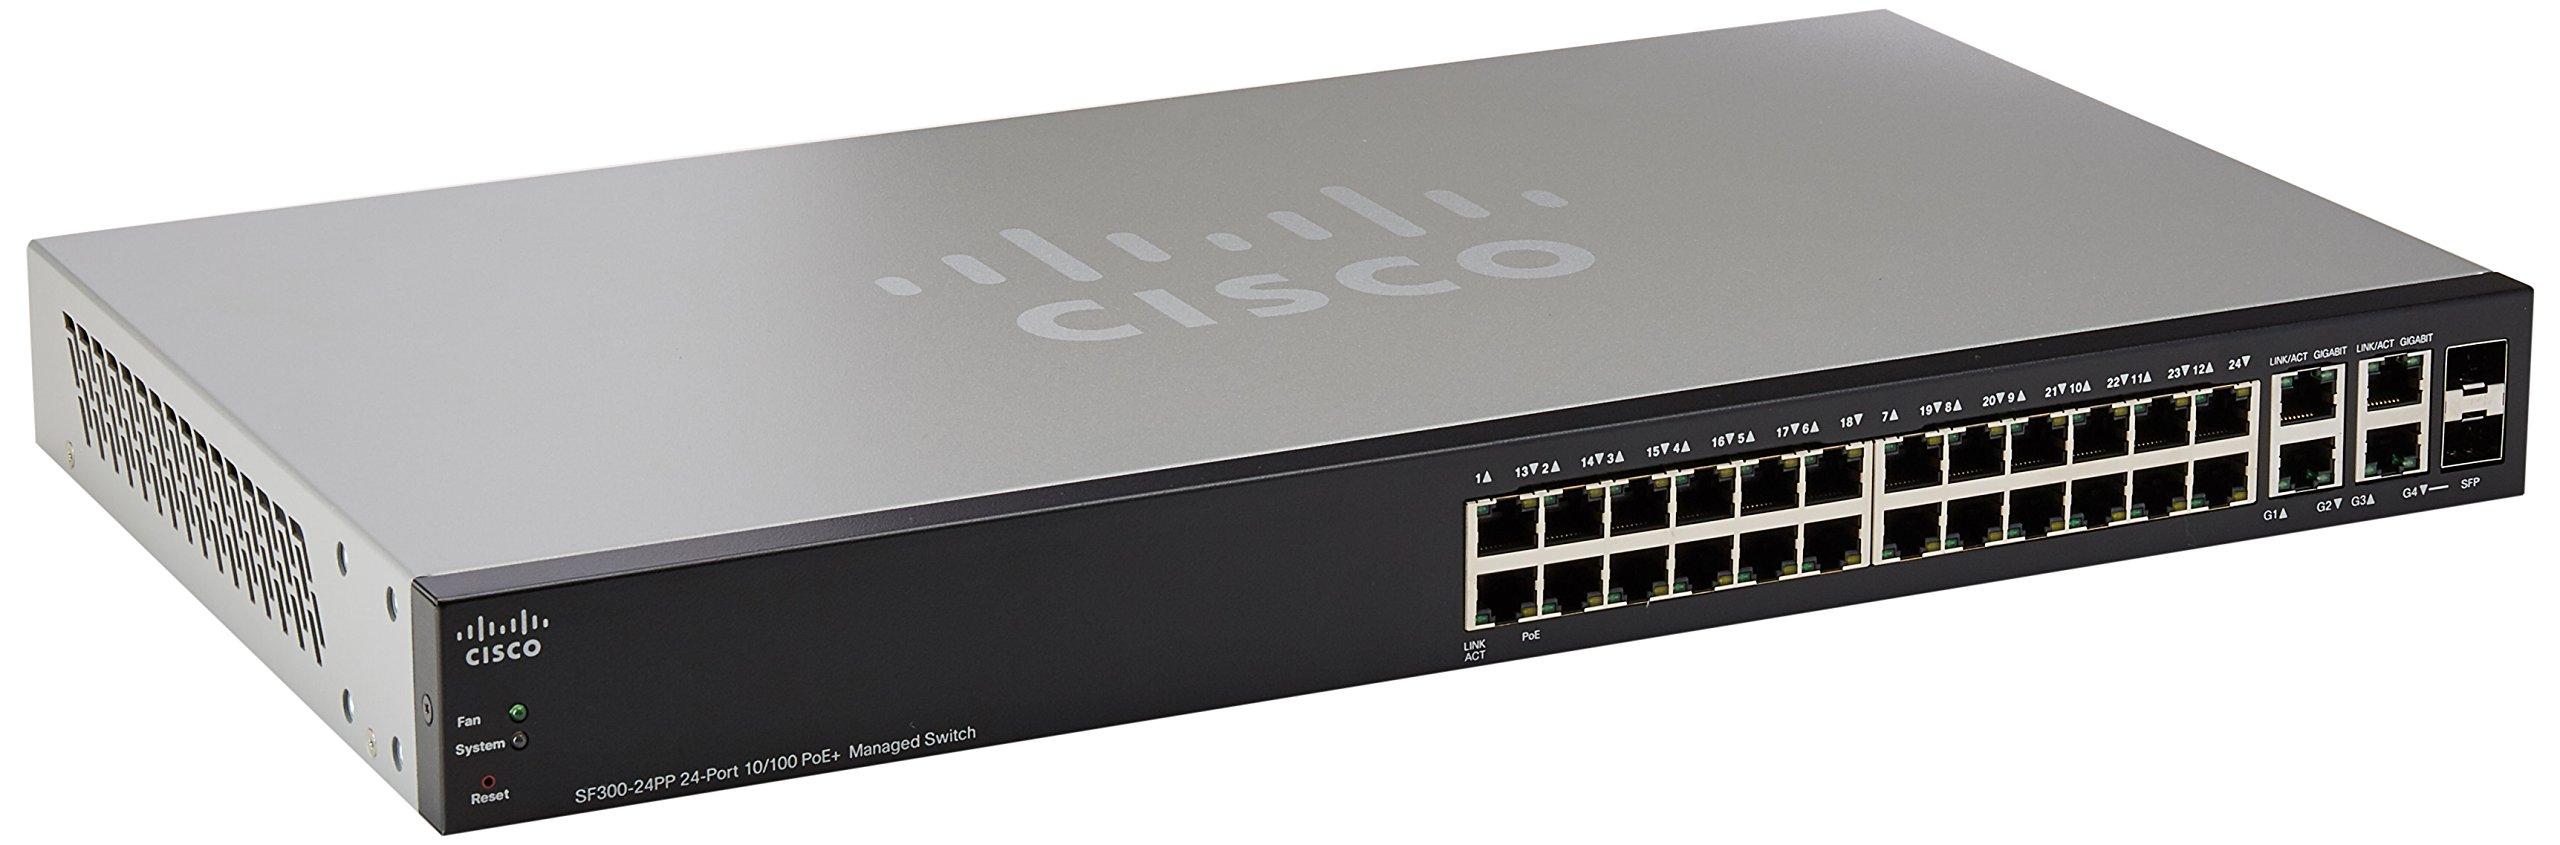 CISCO SF300-24PP 24-Port 10/100 PoE+ Managed Switch w/Gig Uplinks (SF300-24PP-K9-NA)